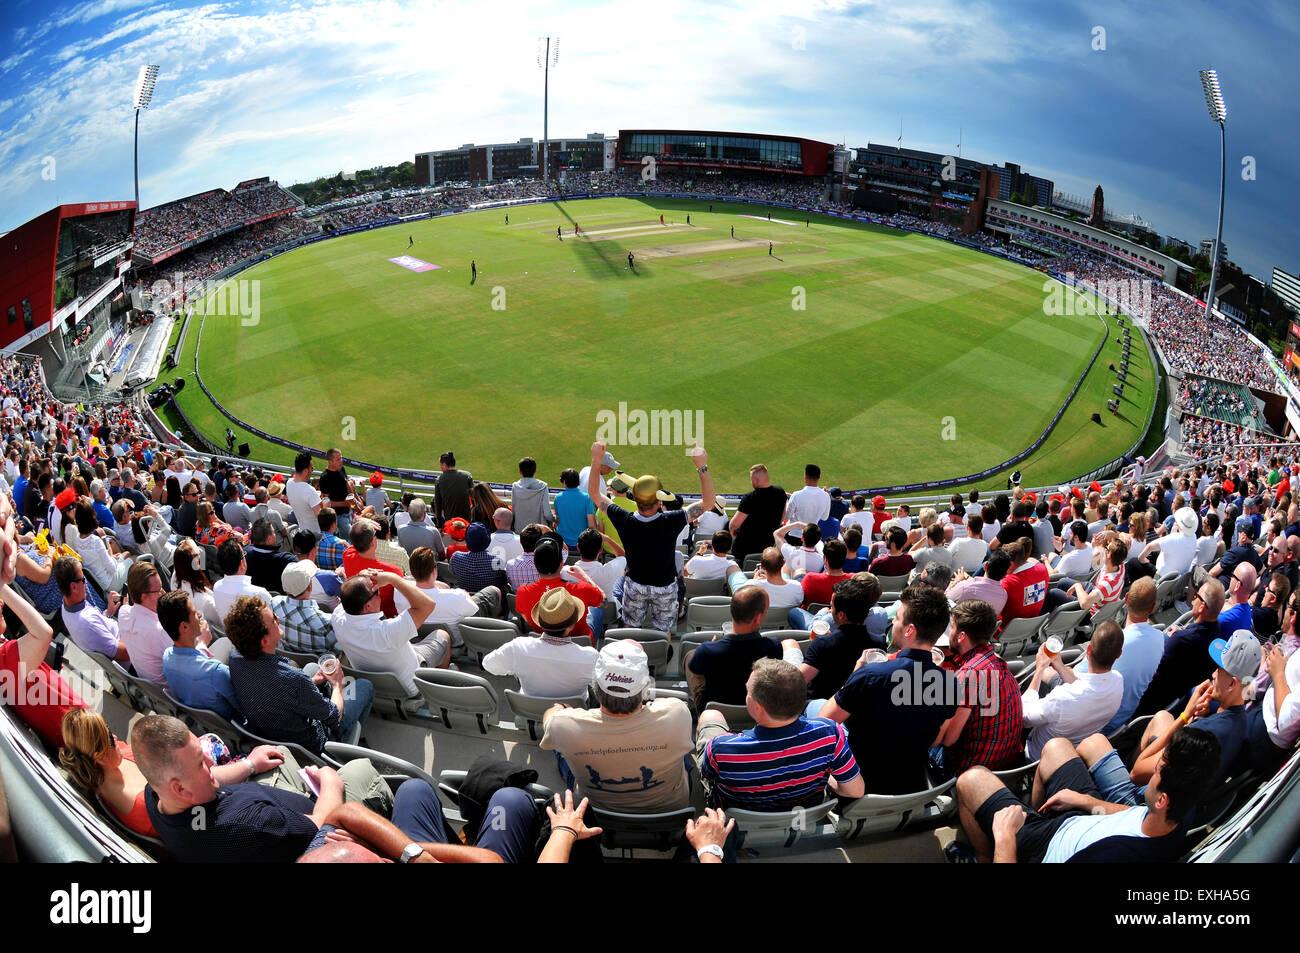 Vue panoramique de unis Old Trafford, Manchester, Angleterre. T20 cricket souffle entre Lancashire et Yorkshire Photo Stock